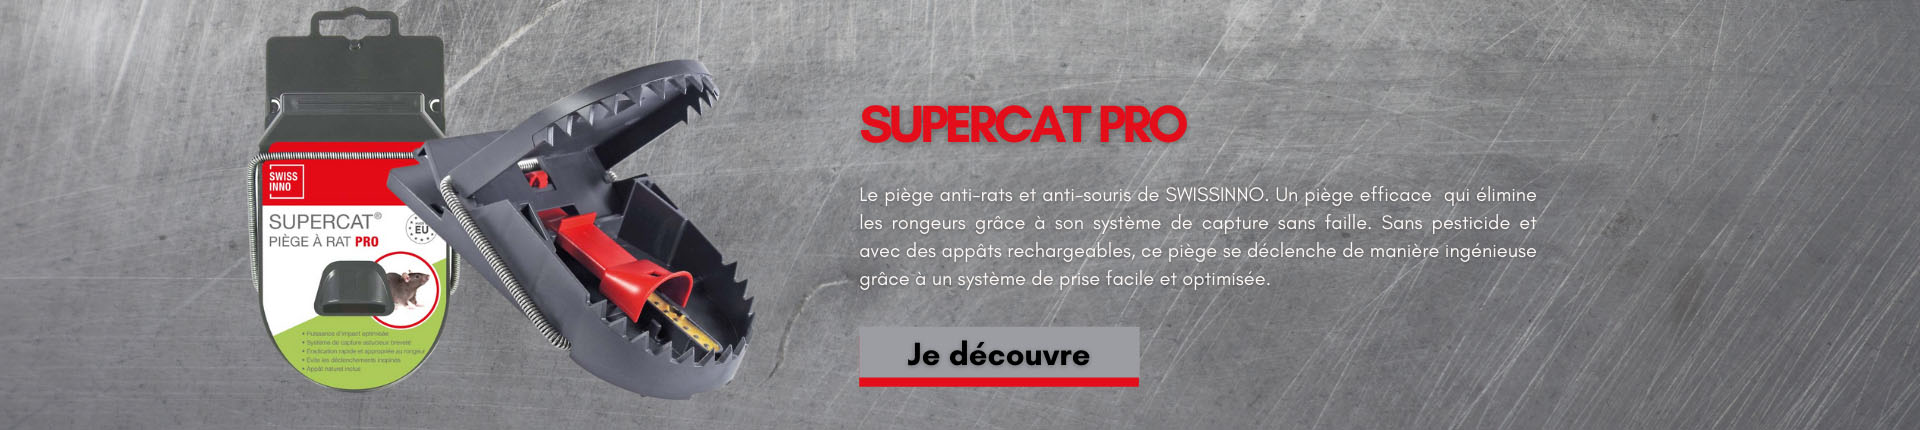 UKAL - Supercatpro